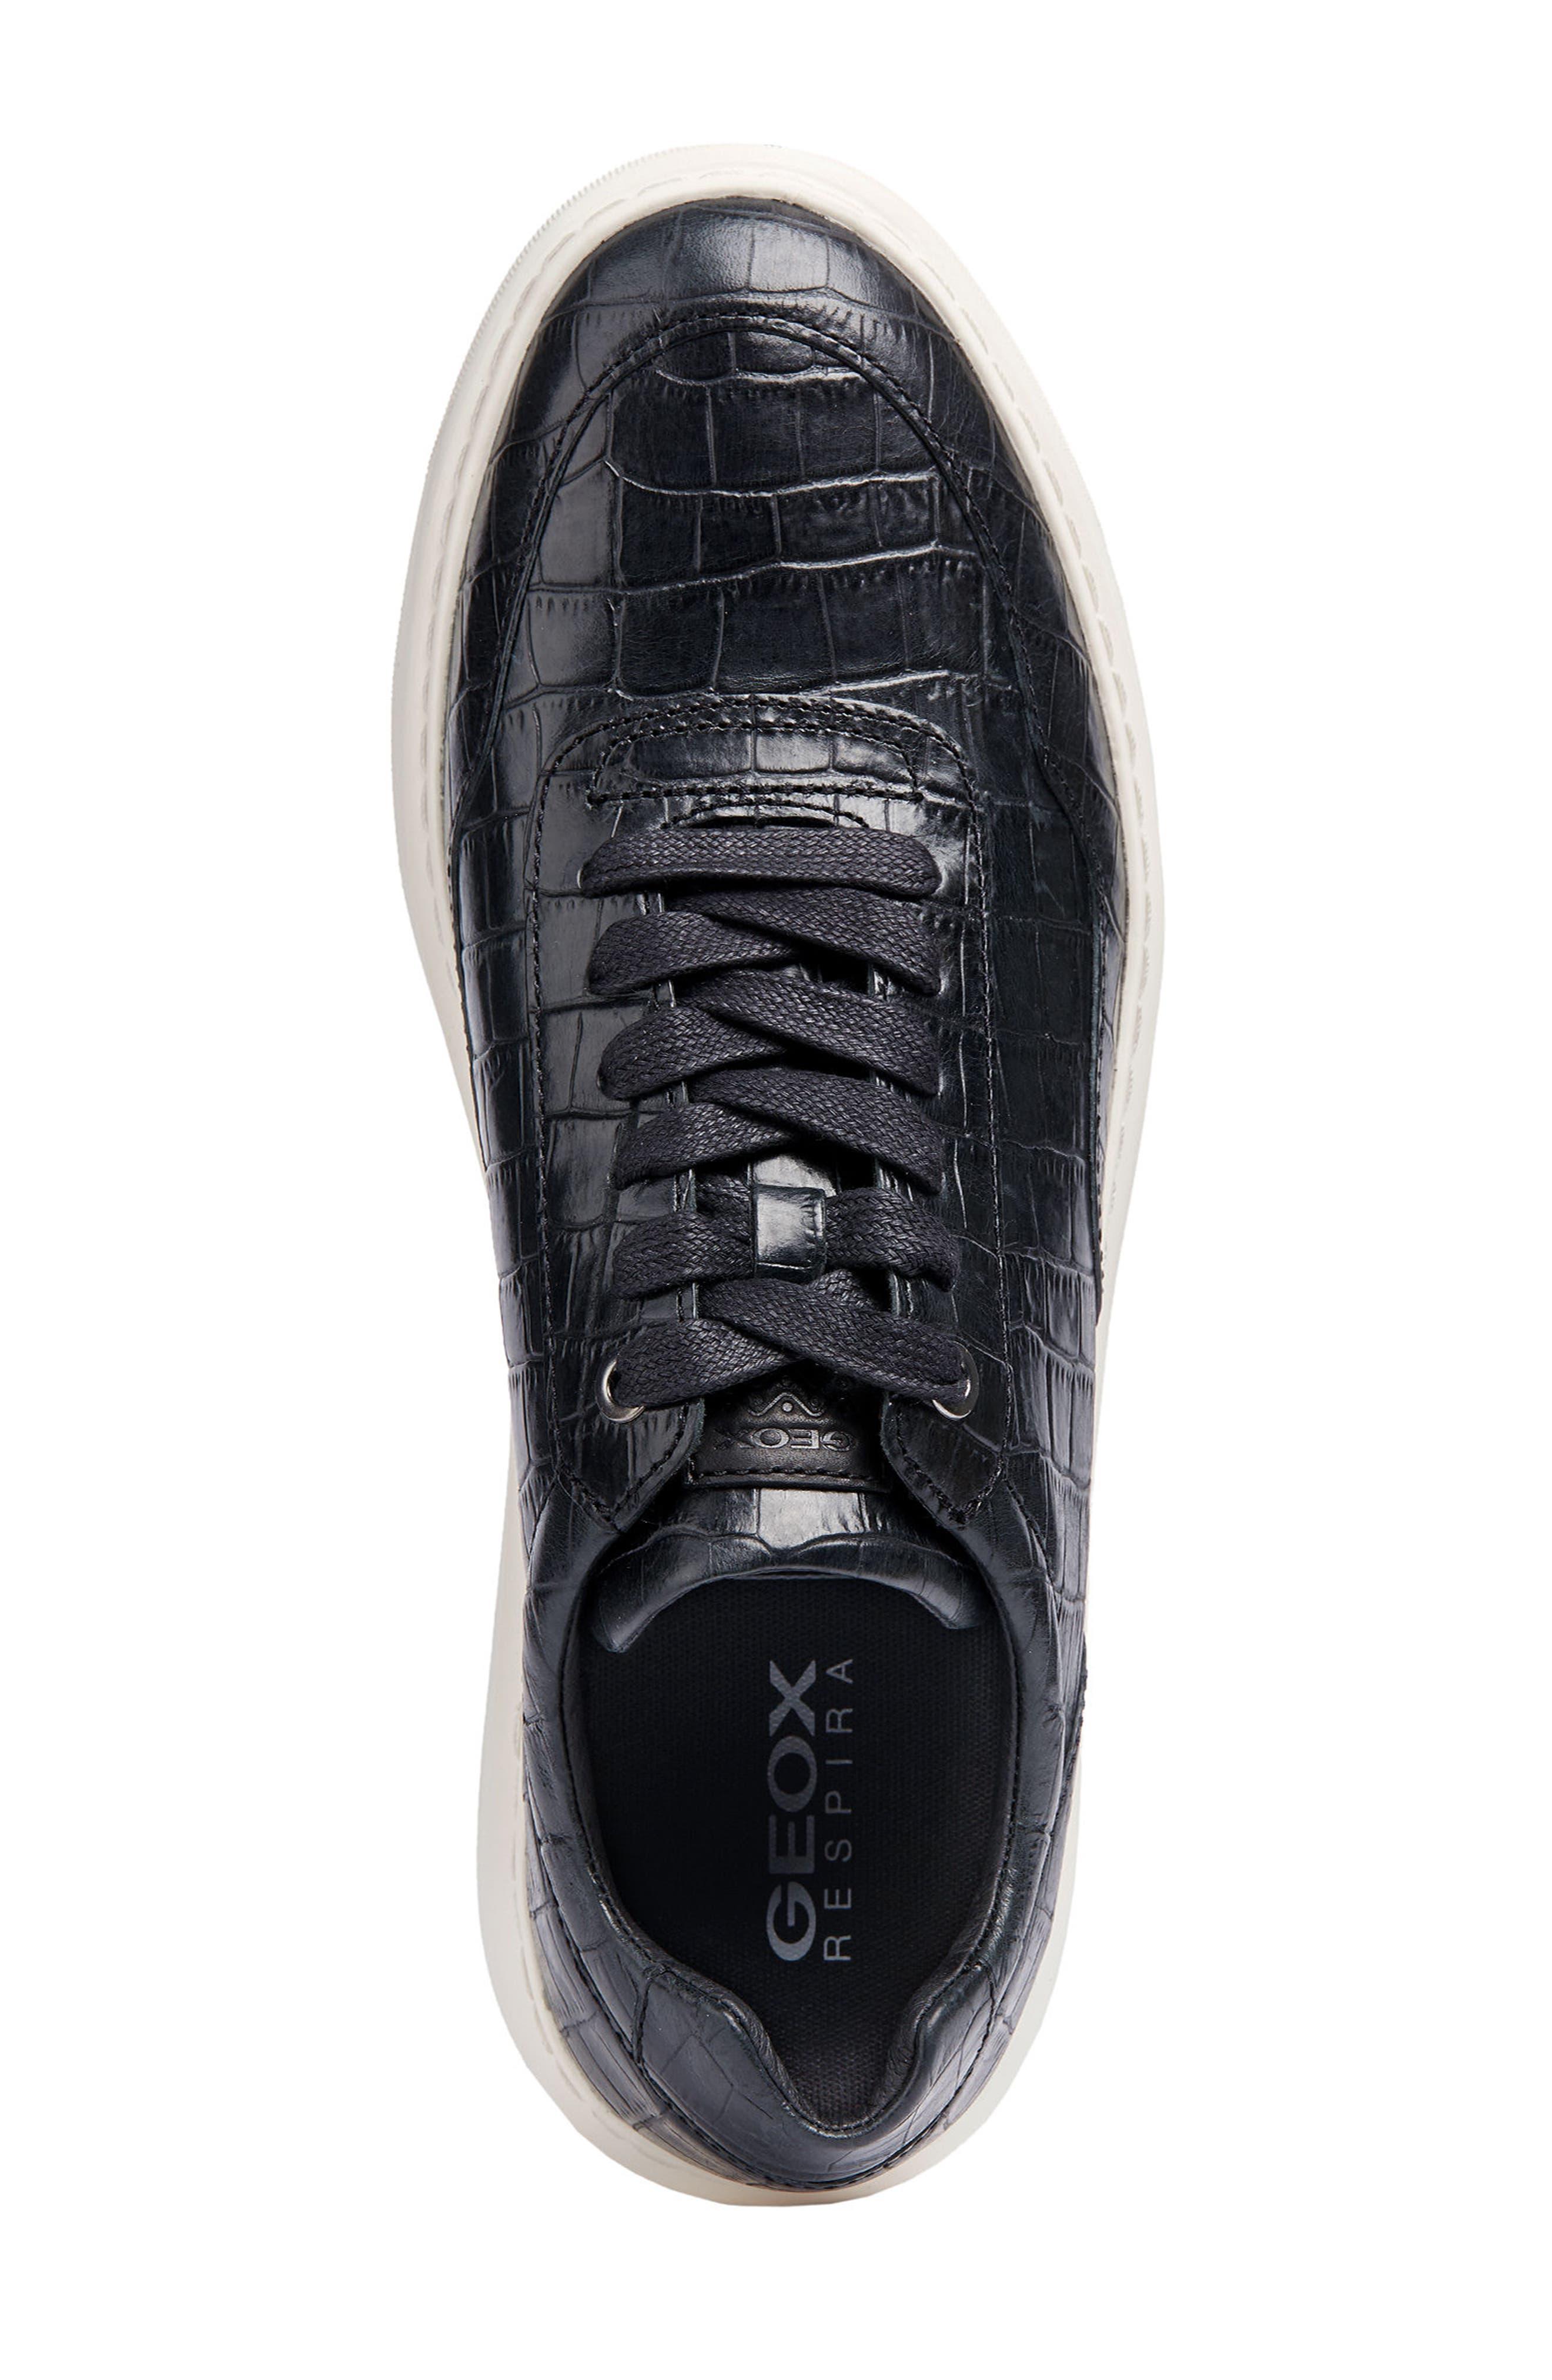 Deiven 8 Croc Textured Low Top Sneaker,                             Alternate thumbnail 5, color,                             BLACK LEATHER